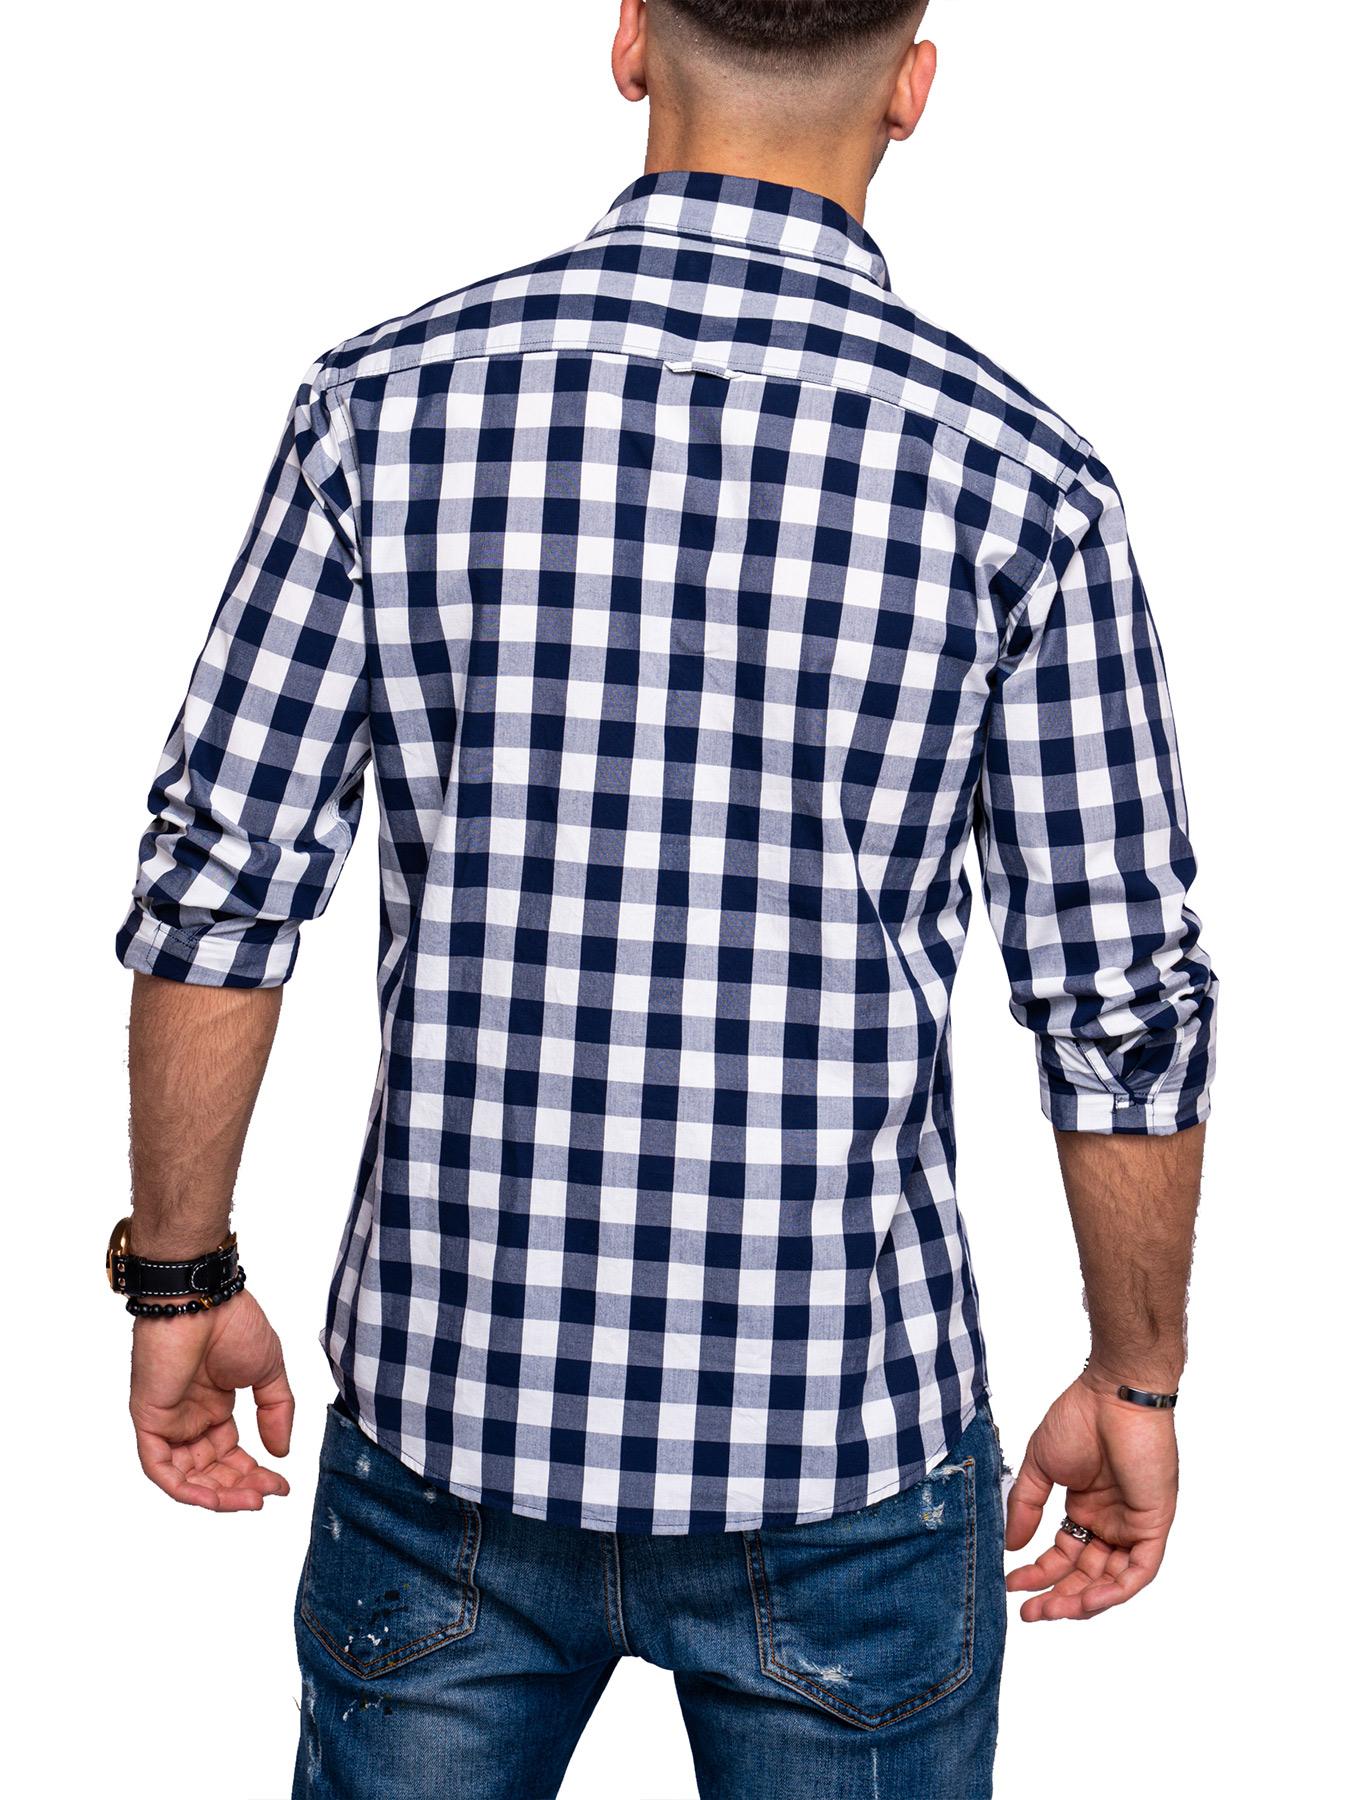 Jack-amp-Jones-Herren-Kariertes-Hemd-Langarmhemd-Freizeithemd-Casual-Karohemd Indexbild 6